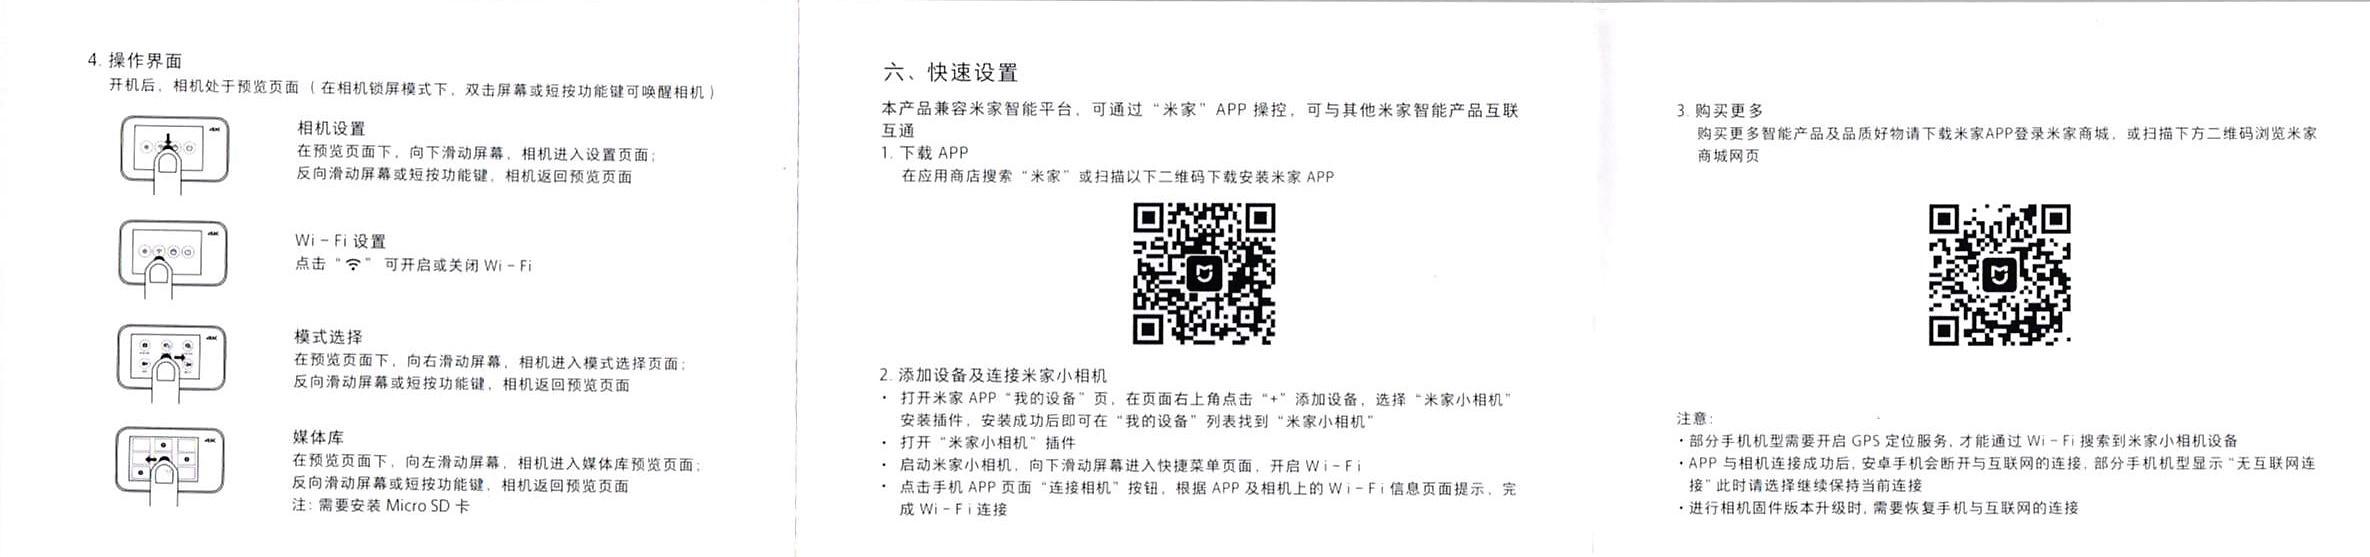 Xiaomi Mijia Camera Mini アクションカメラ 取説3